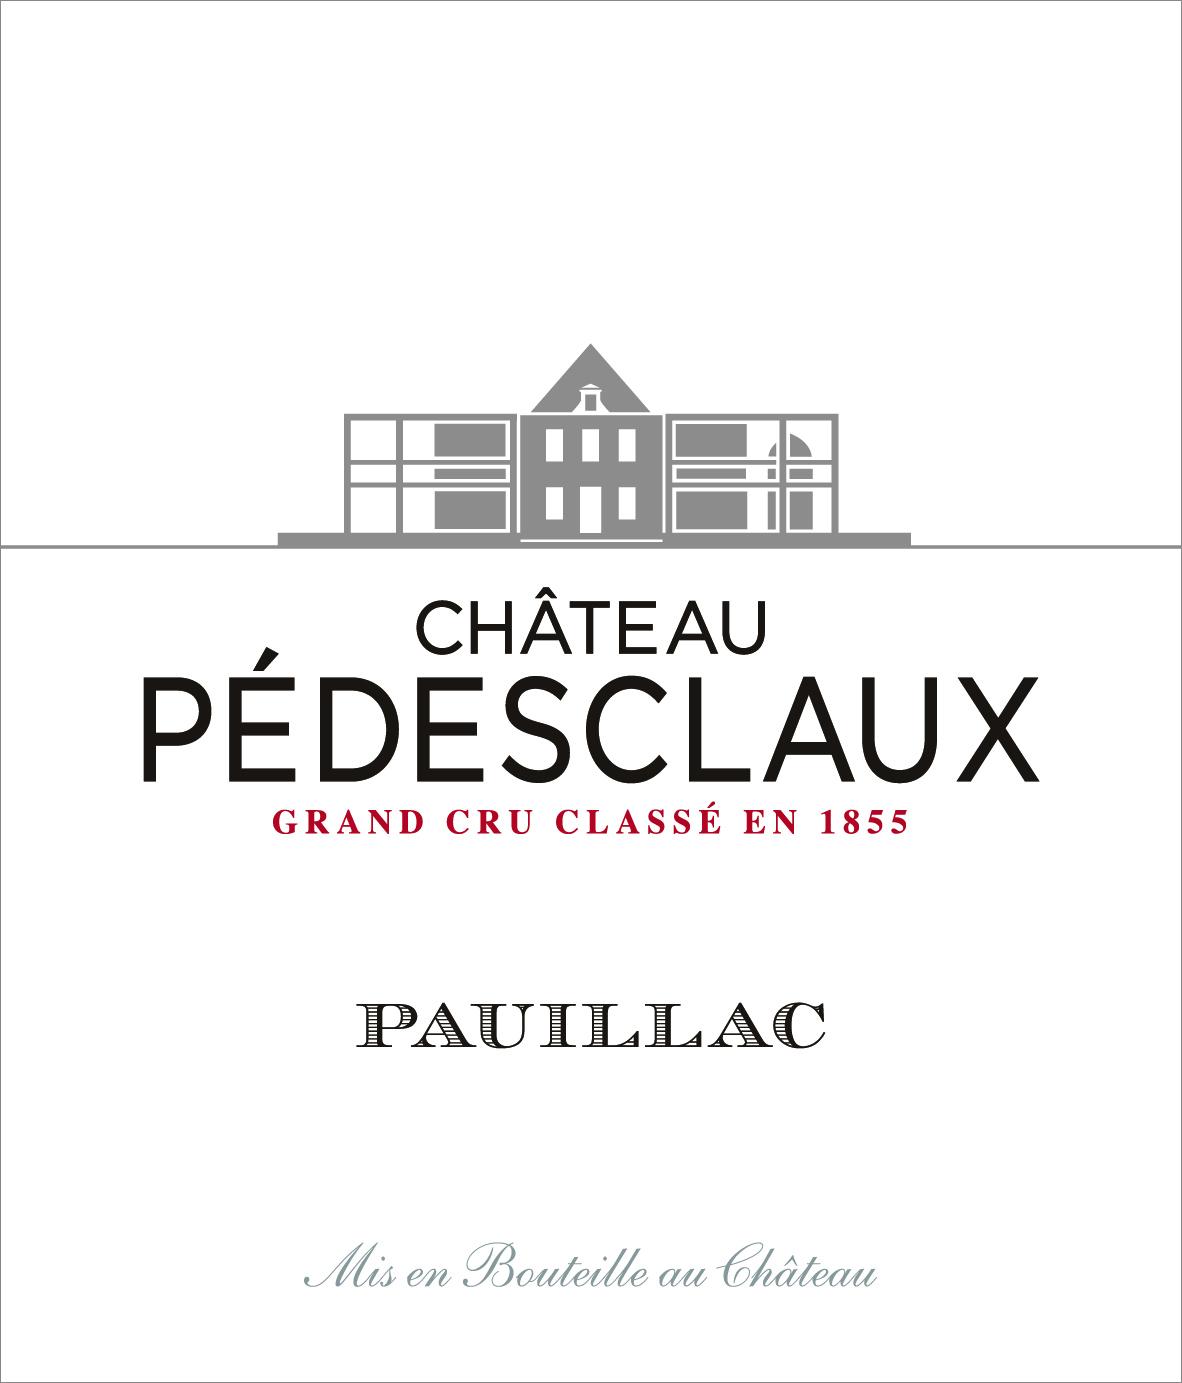 Château Pedesclaux